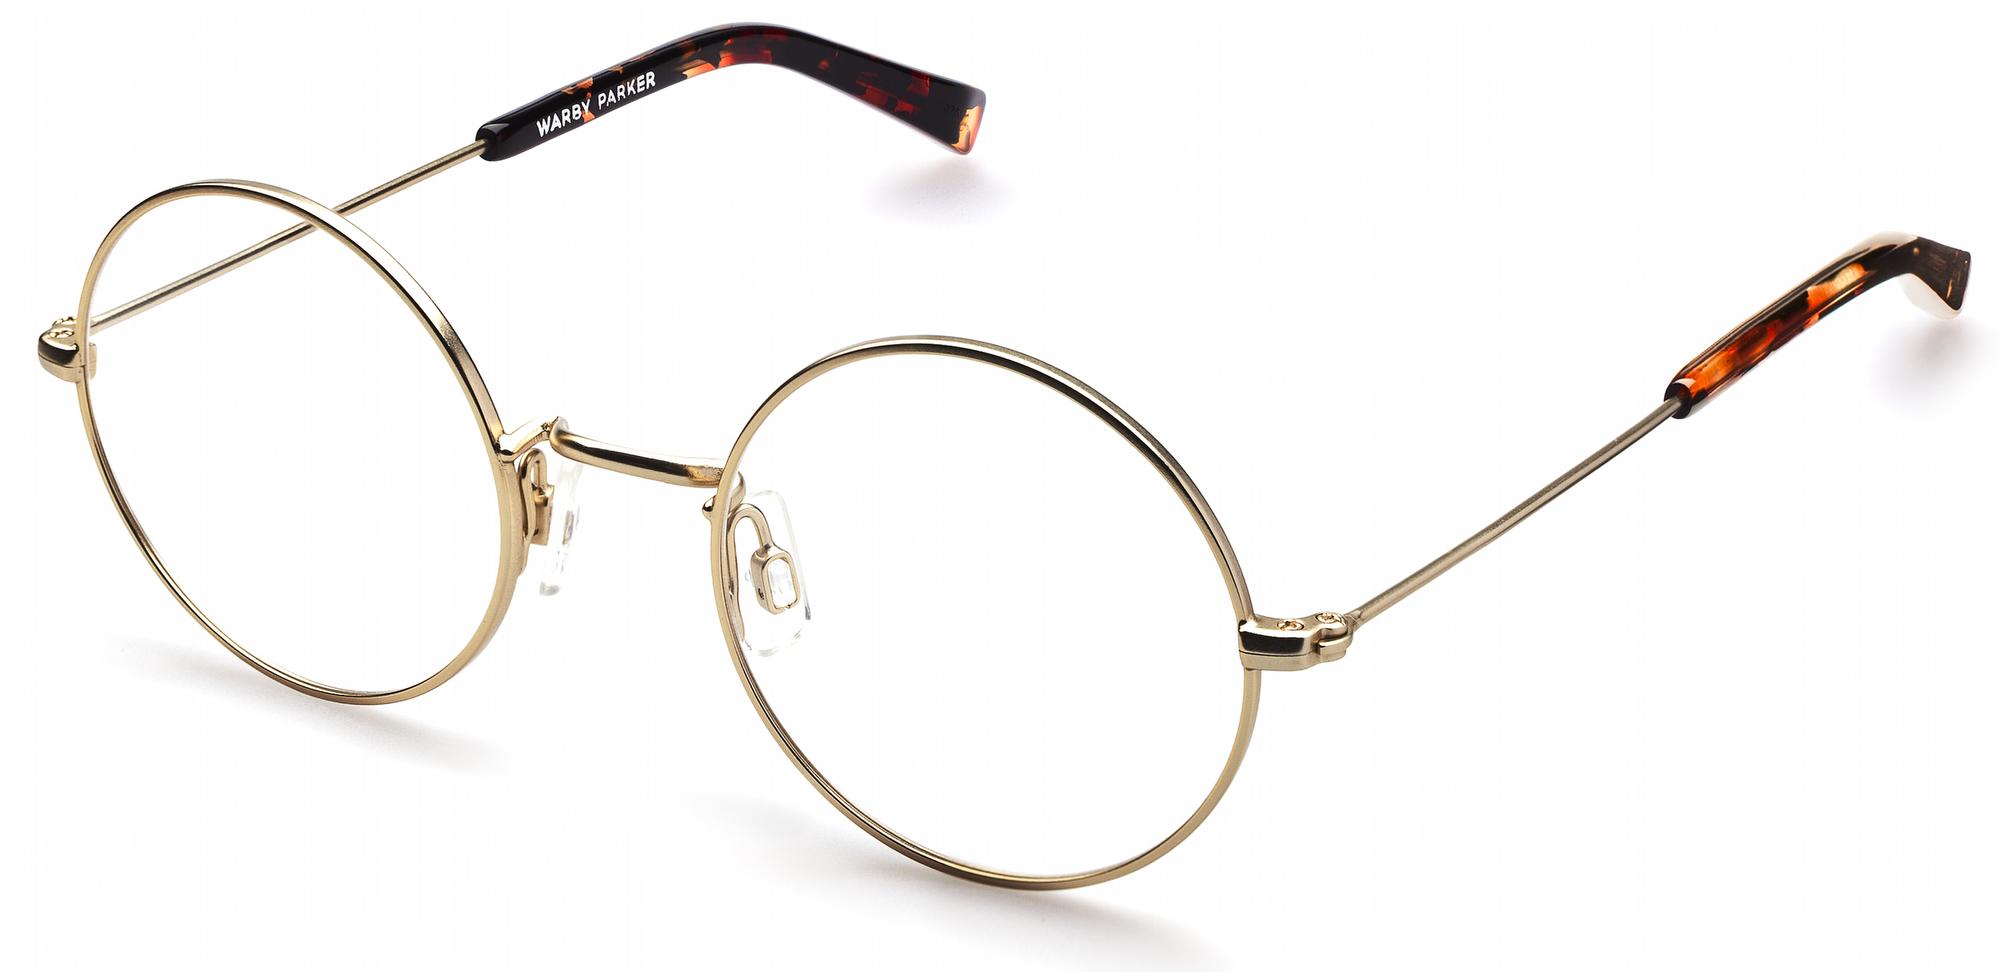 Warby Parker Christina Does